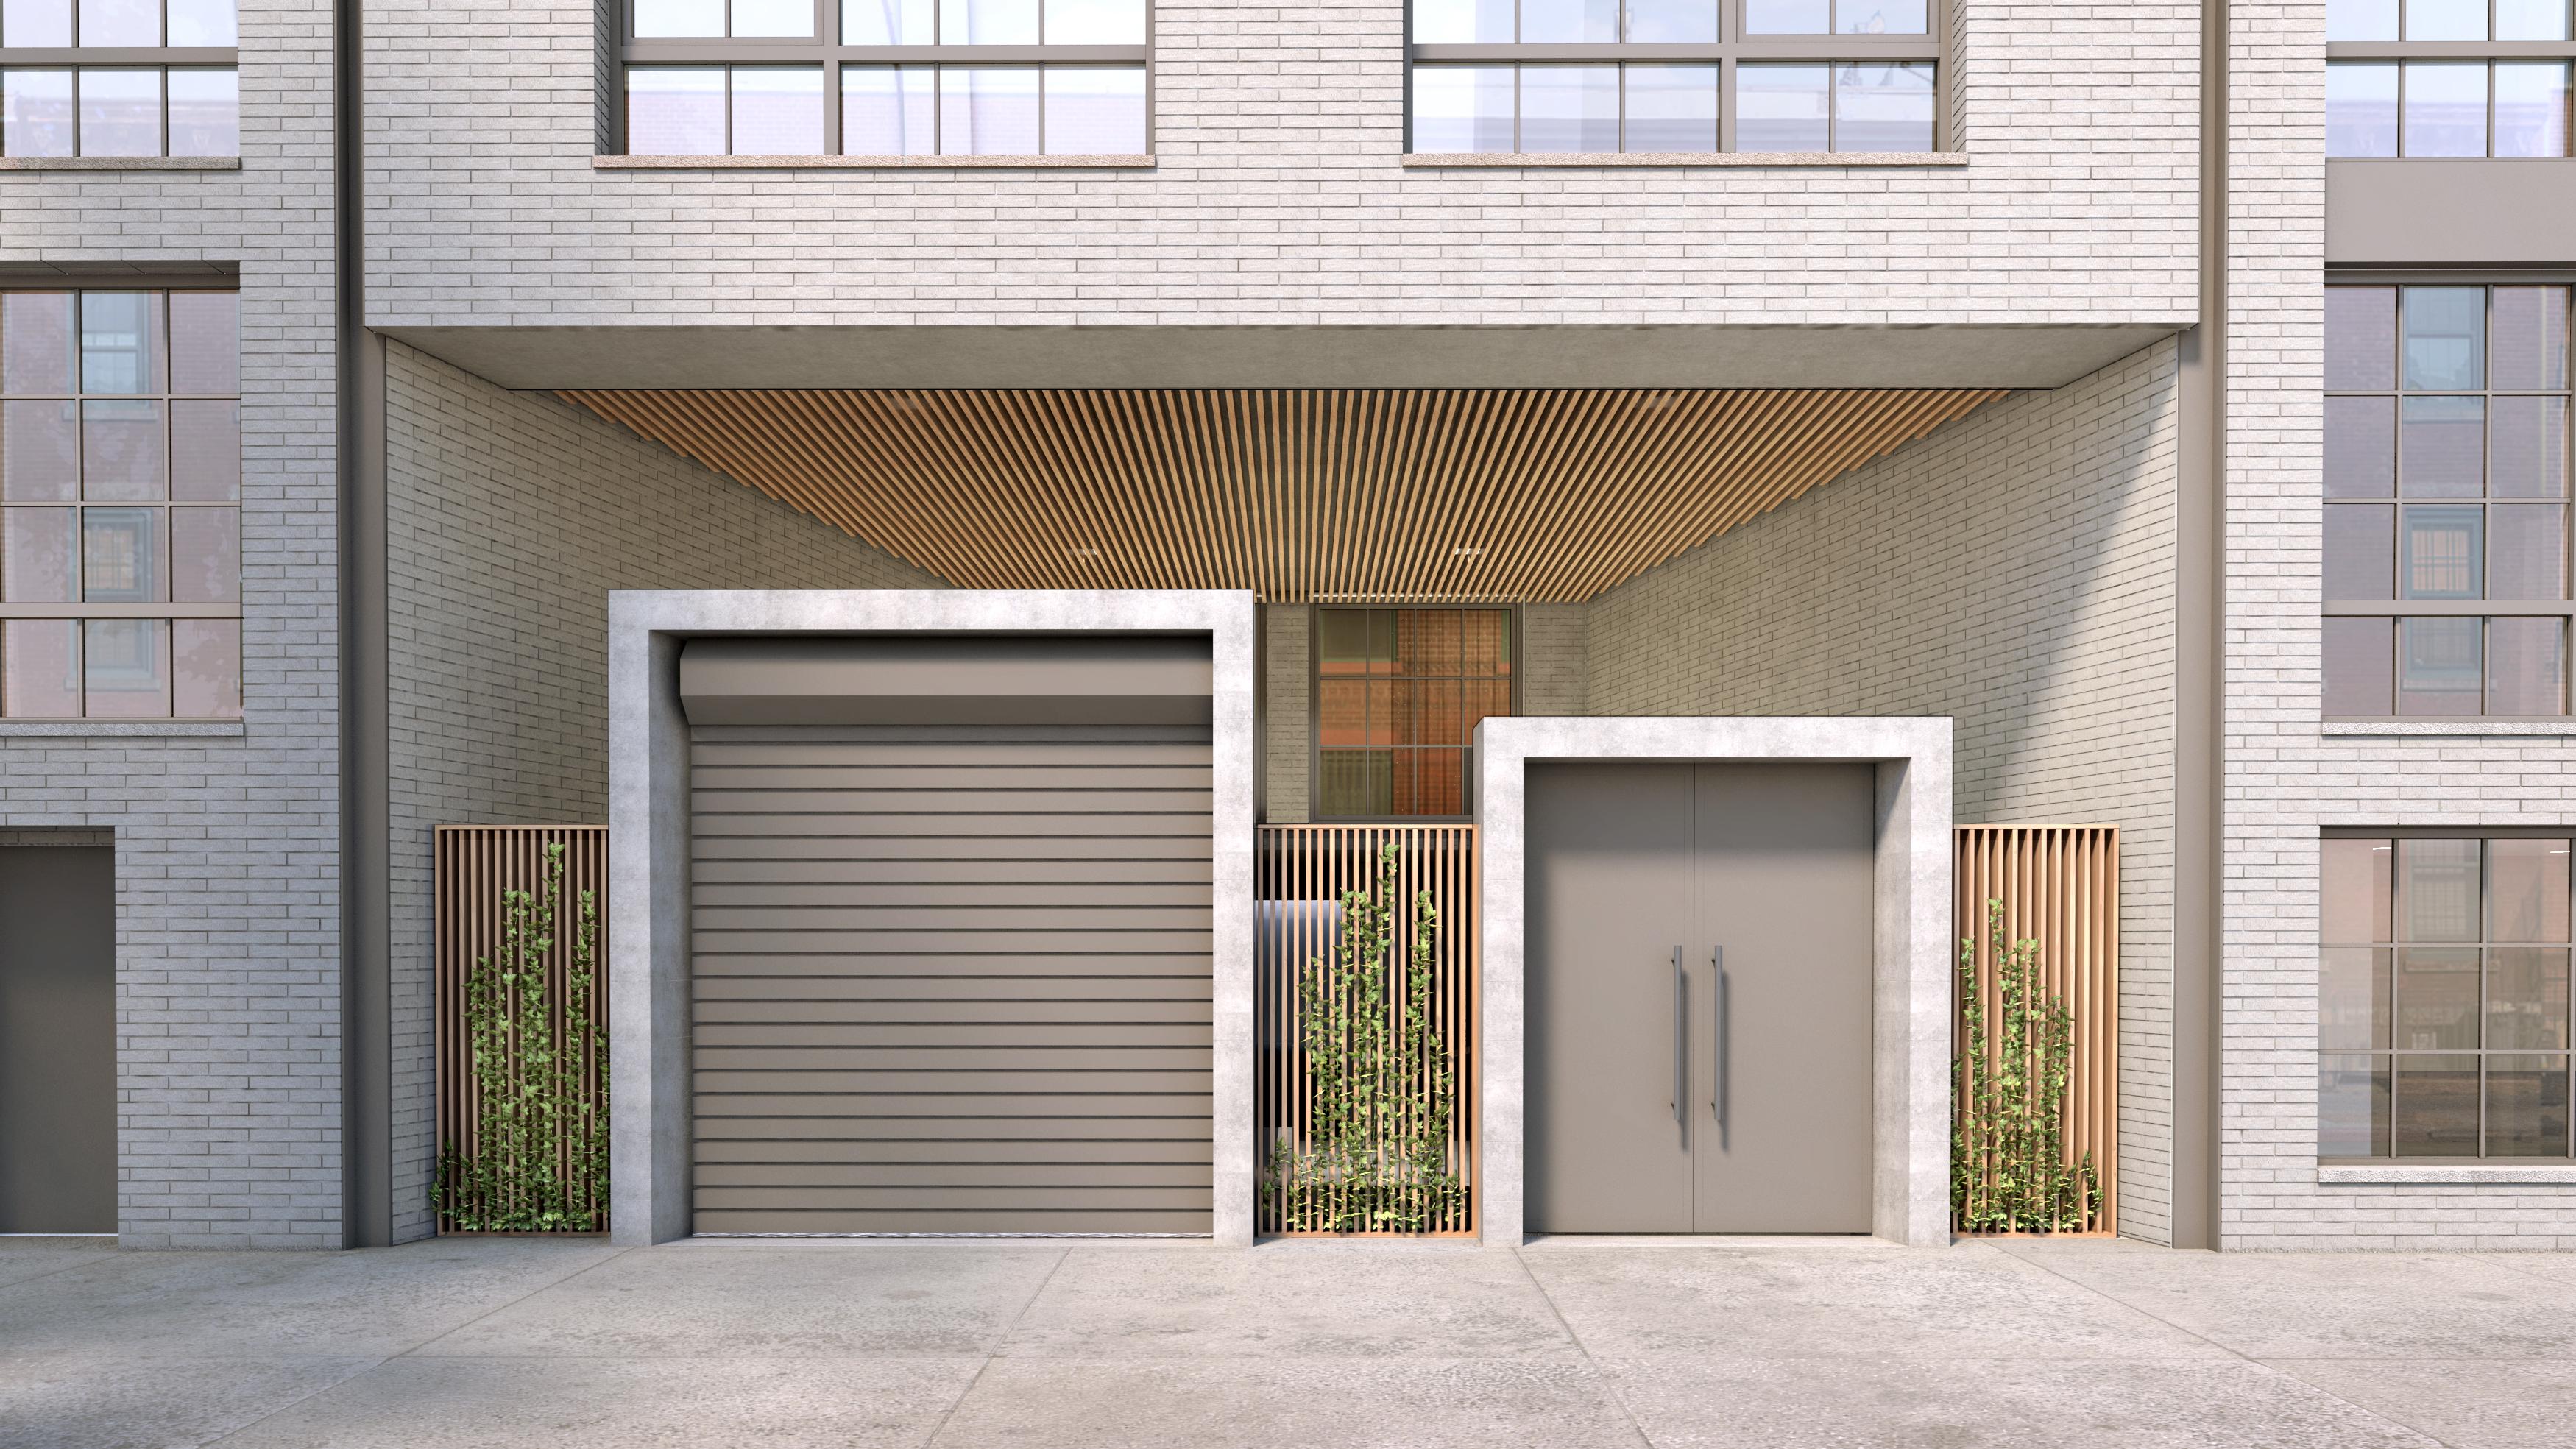 77 Clarkson Avenue Prospect Leffert Gdn Brooklyn NY 11226